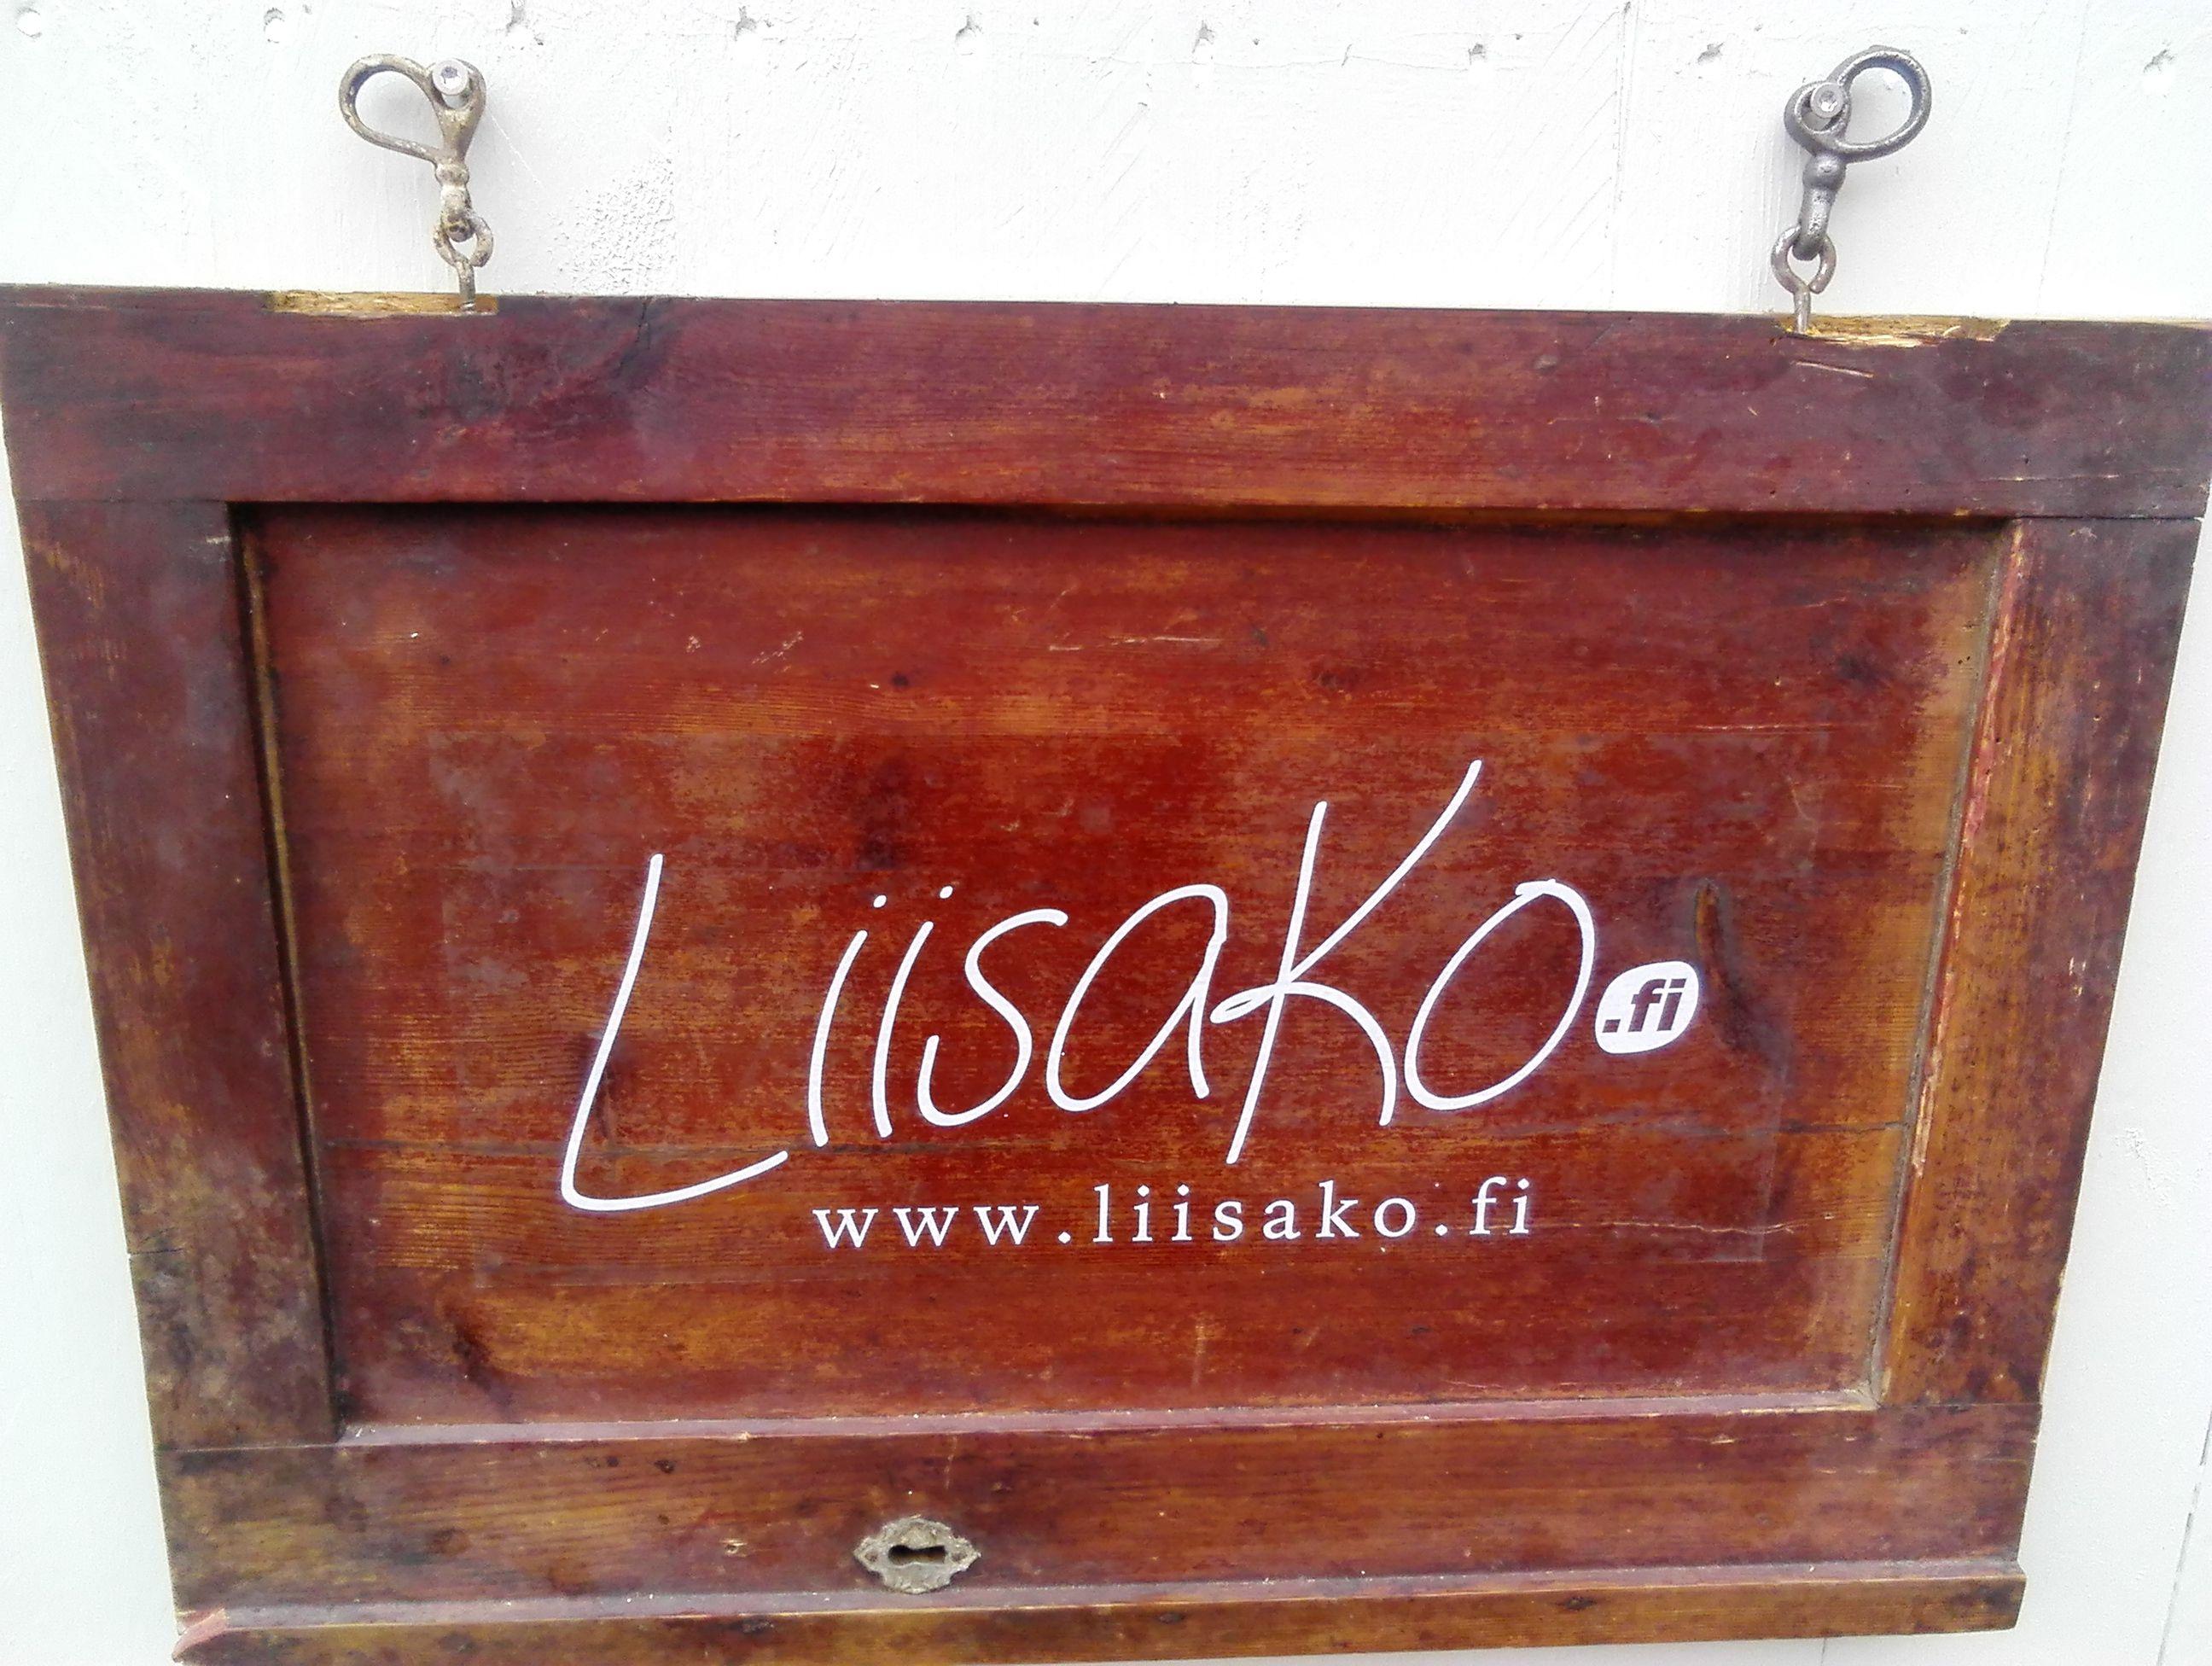 LiisaKon Puoti suljettuna 25-28.5.2017